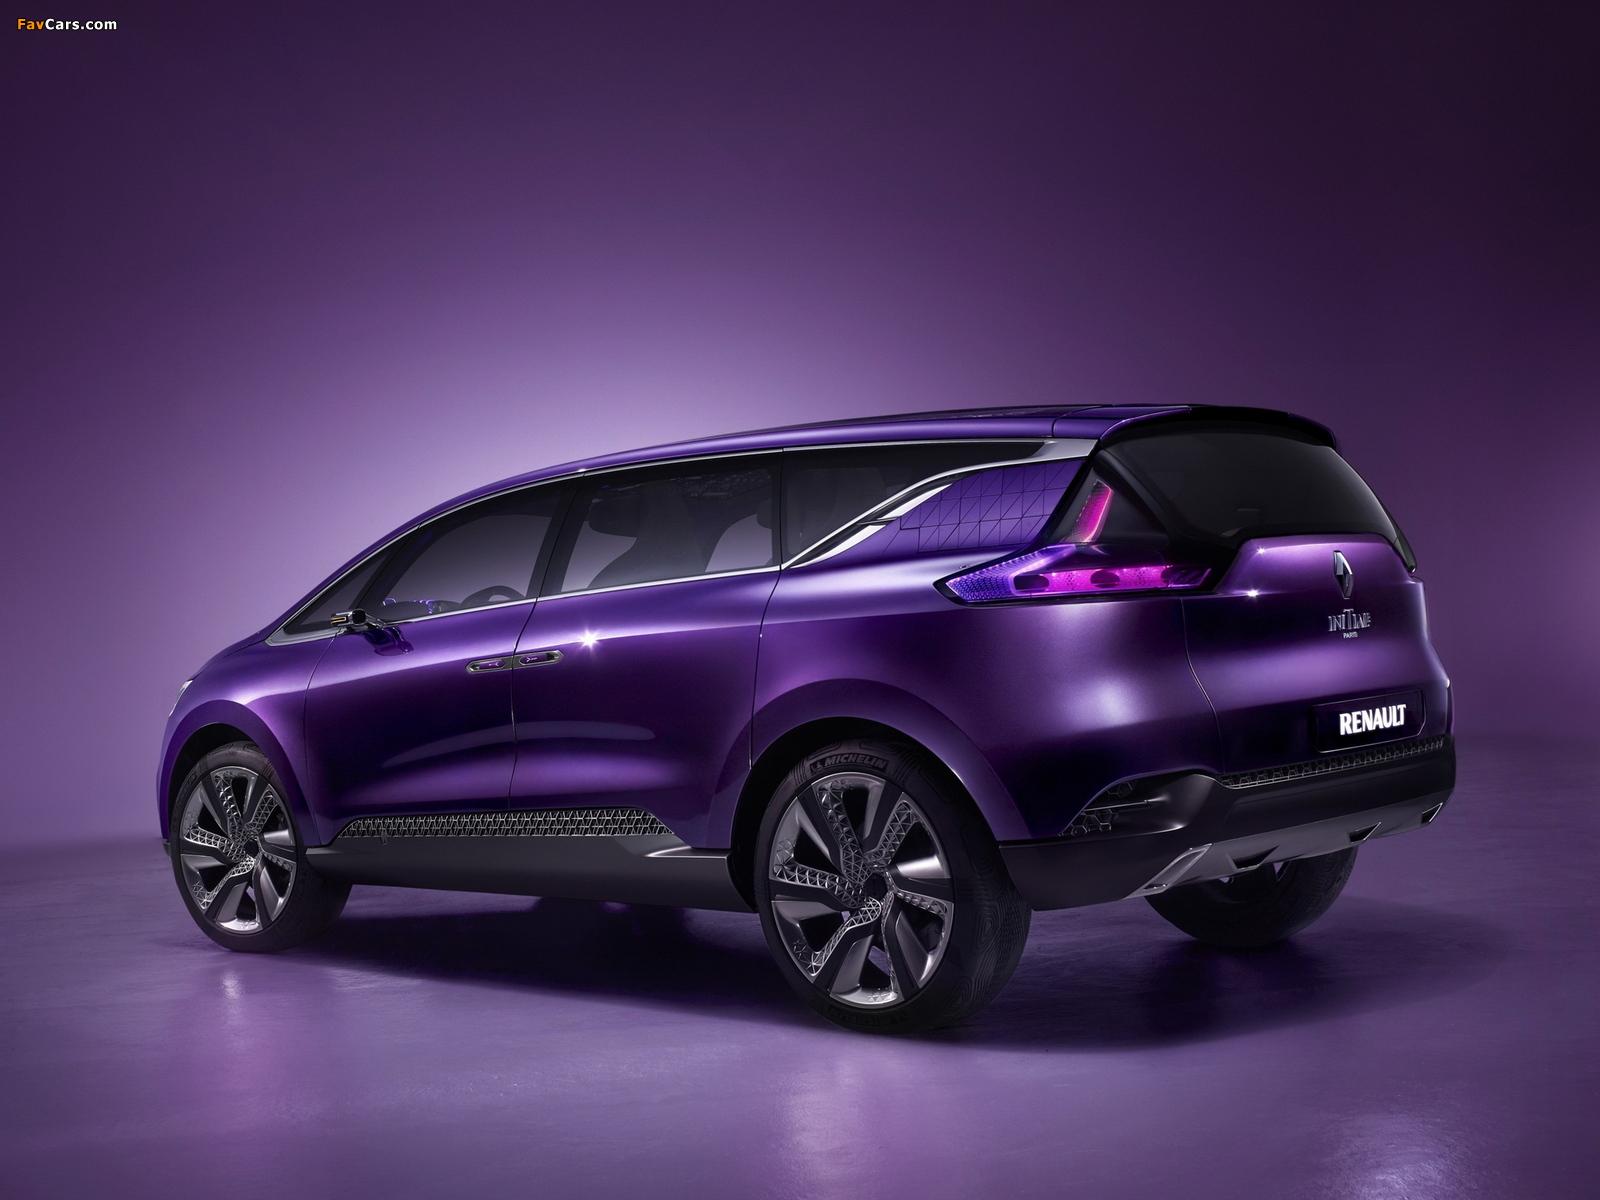 Renault Initiale Paris Concept 2013 pictures (1600 x 1200)